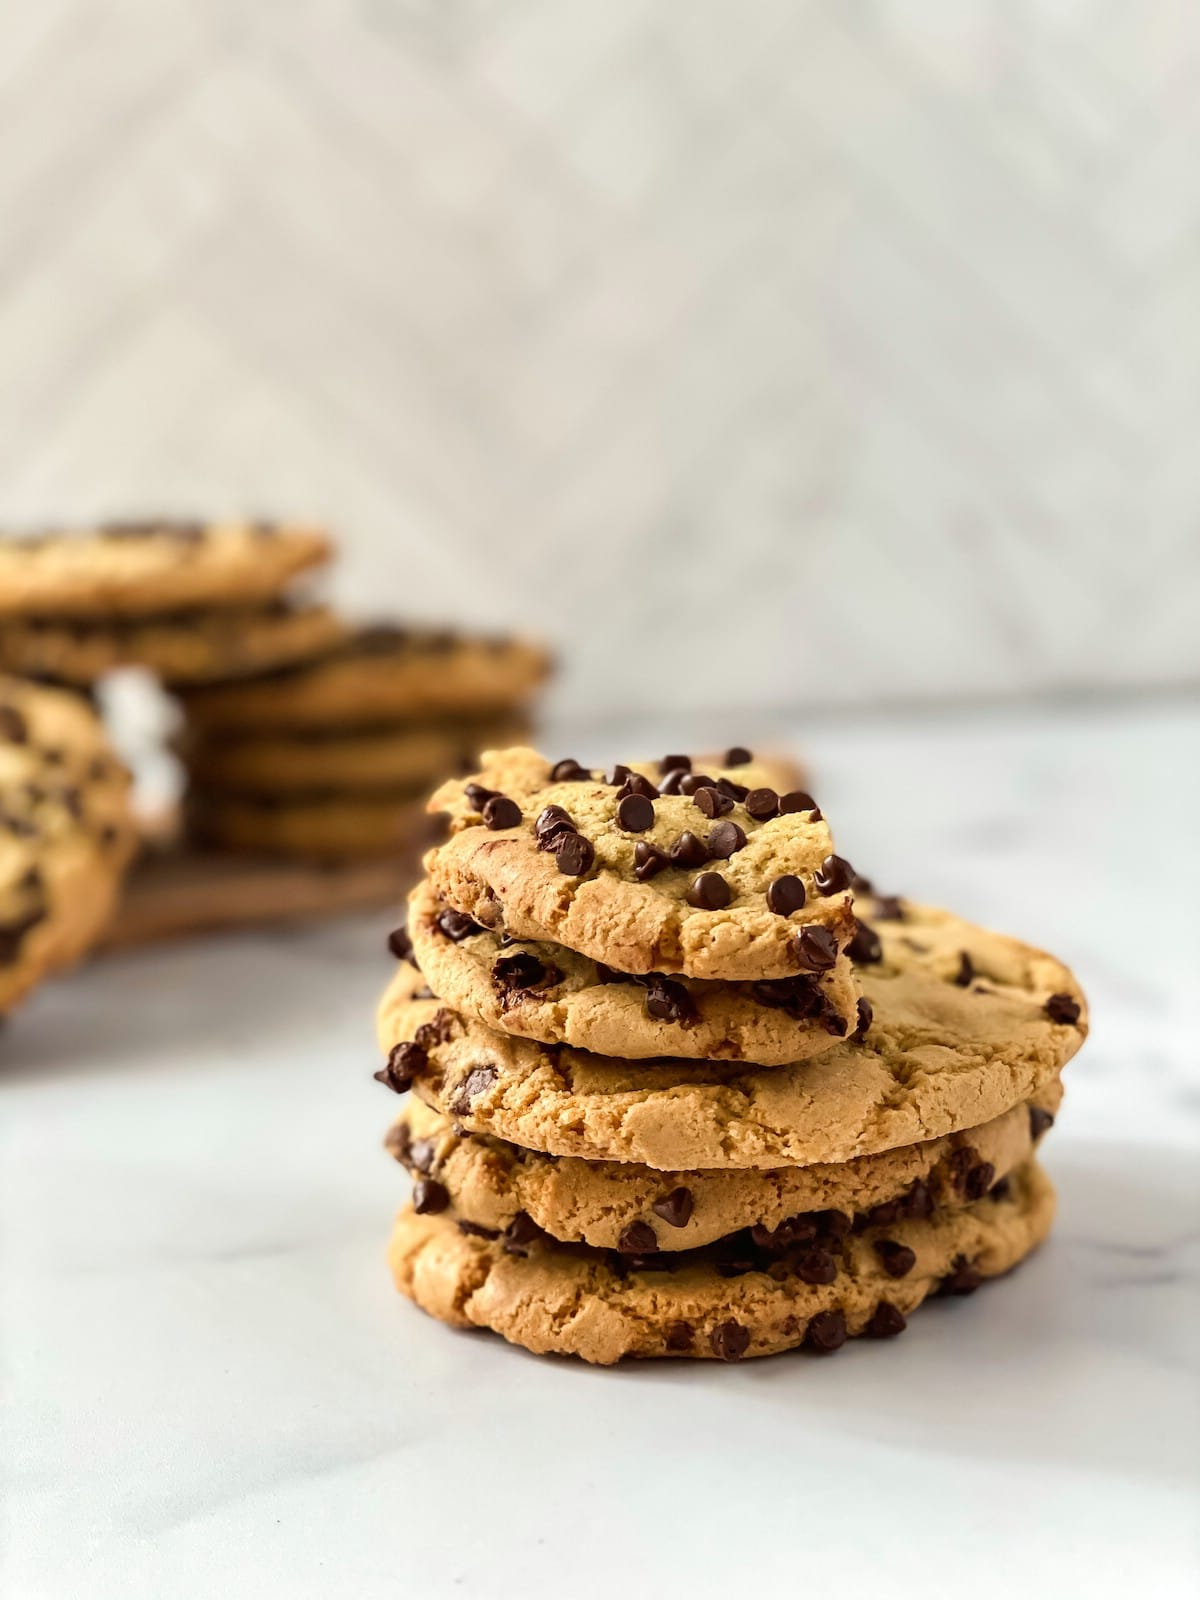 Half eaten cookie on top of stack